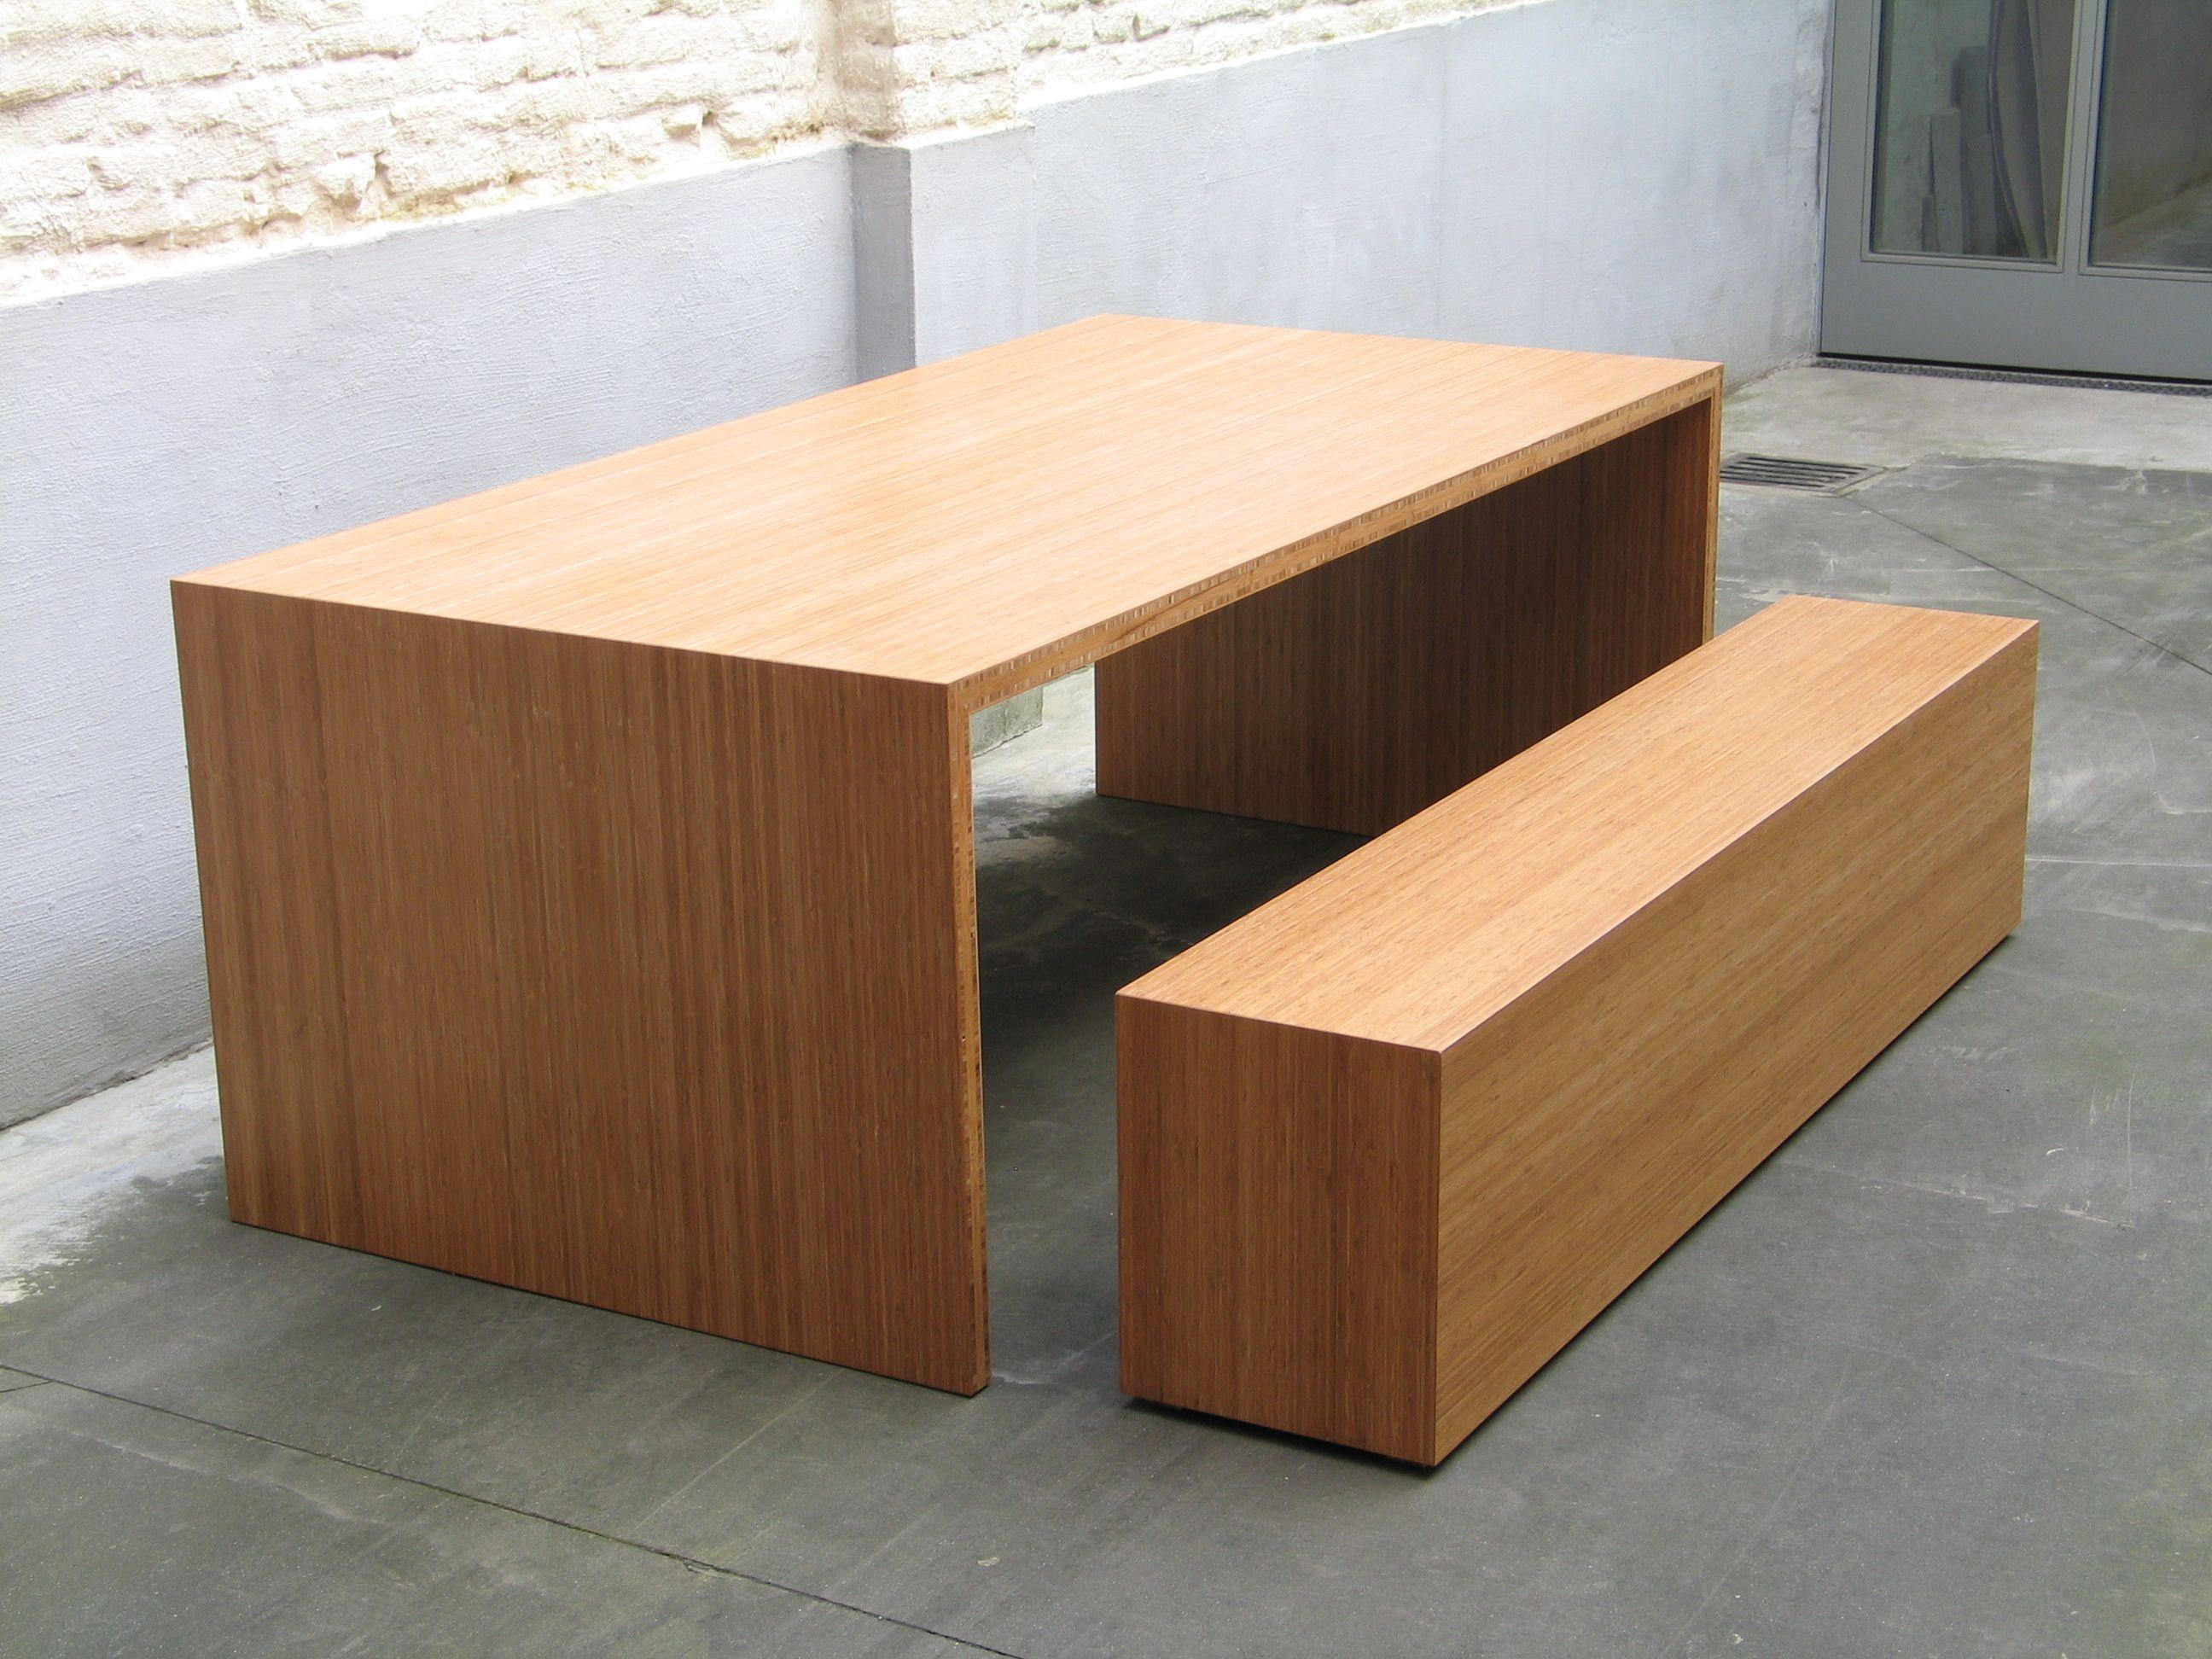 Stressless Multifunctionele Tafel : Tafeltje over de bank just jeanette bank tafelu bank tafel